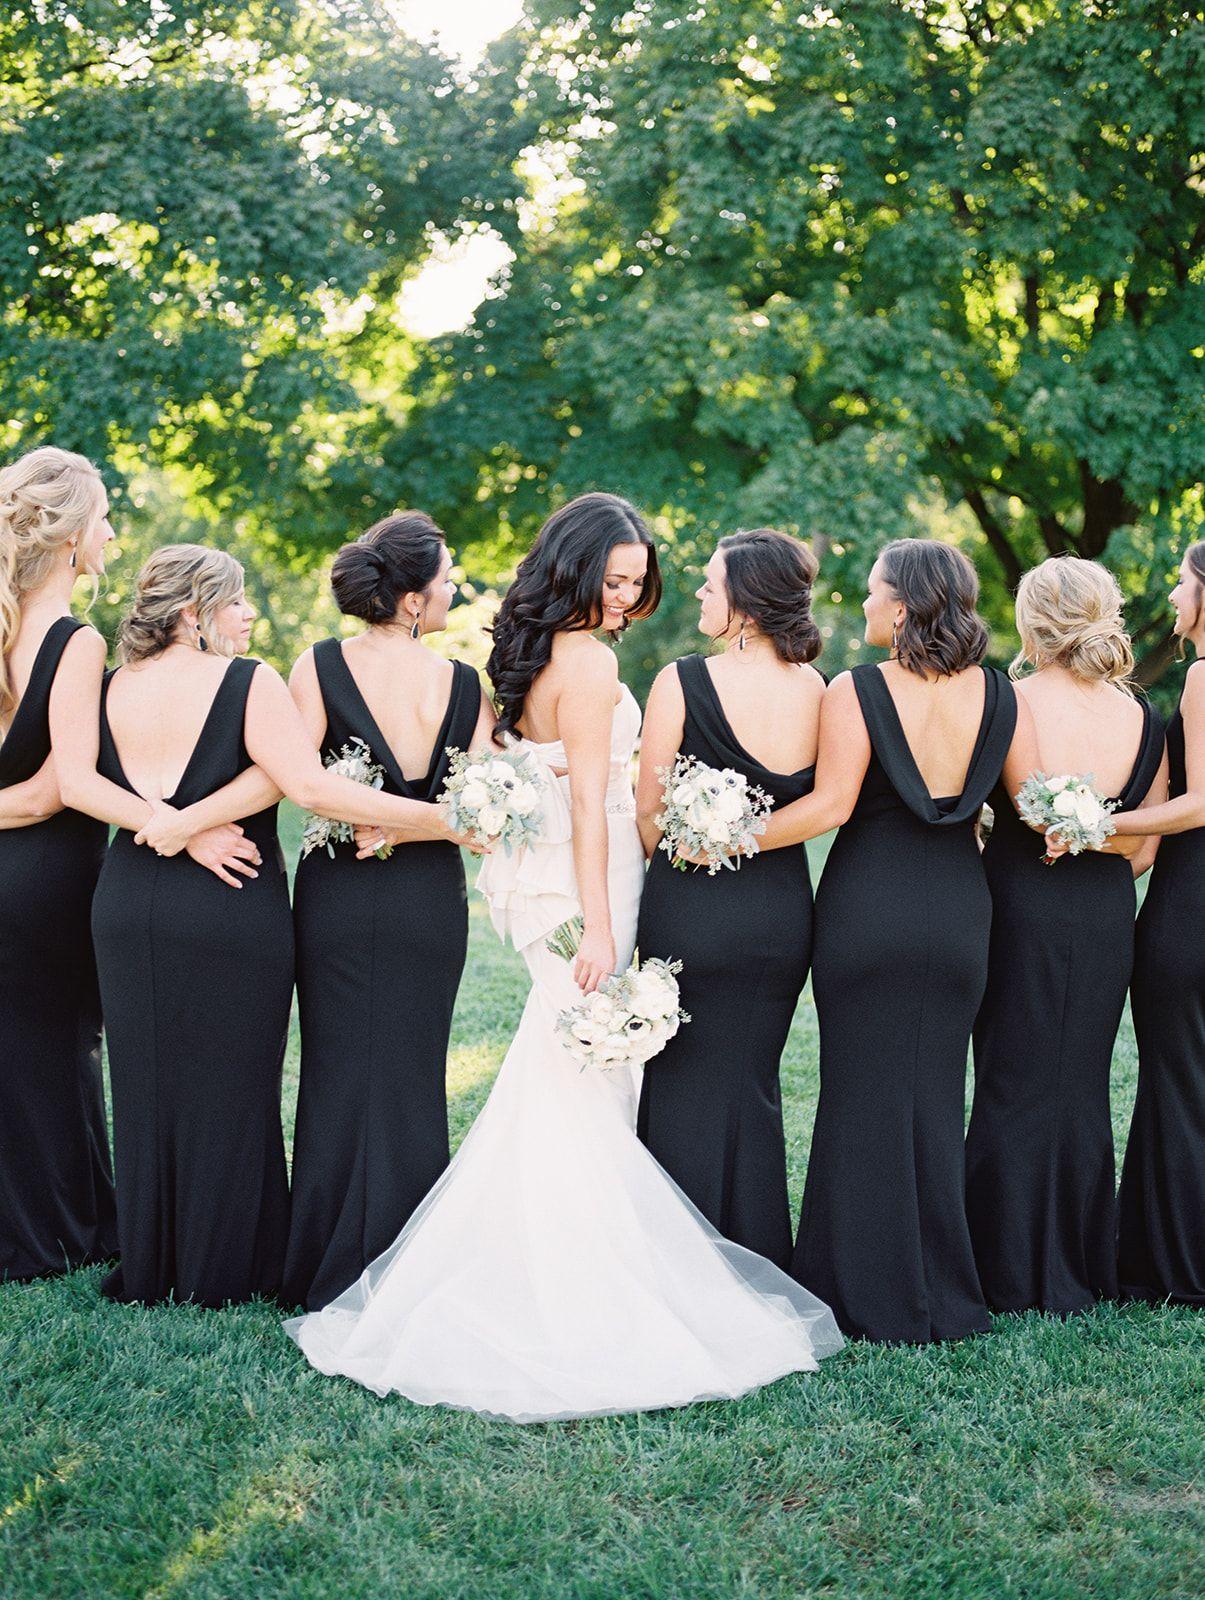 Wedding Dress Inspo Bridal Party Black Bridesmaid S Dresses Black And White Wedding Theme Black Bridal Parties Wedding Bridesmaid Dresses [ 1600 x 1205 Pixel ]